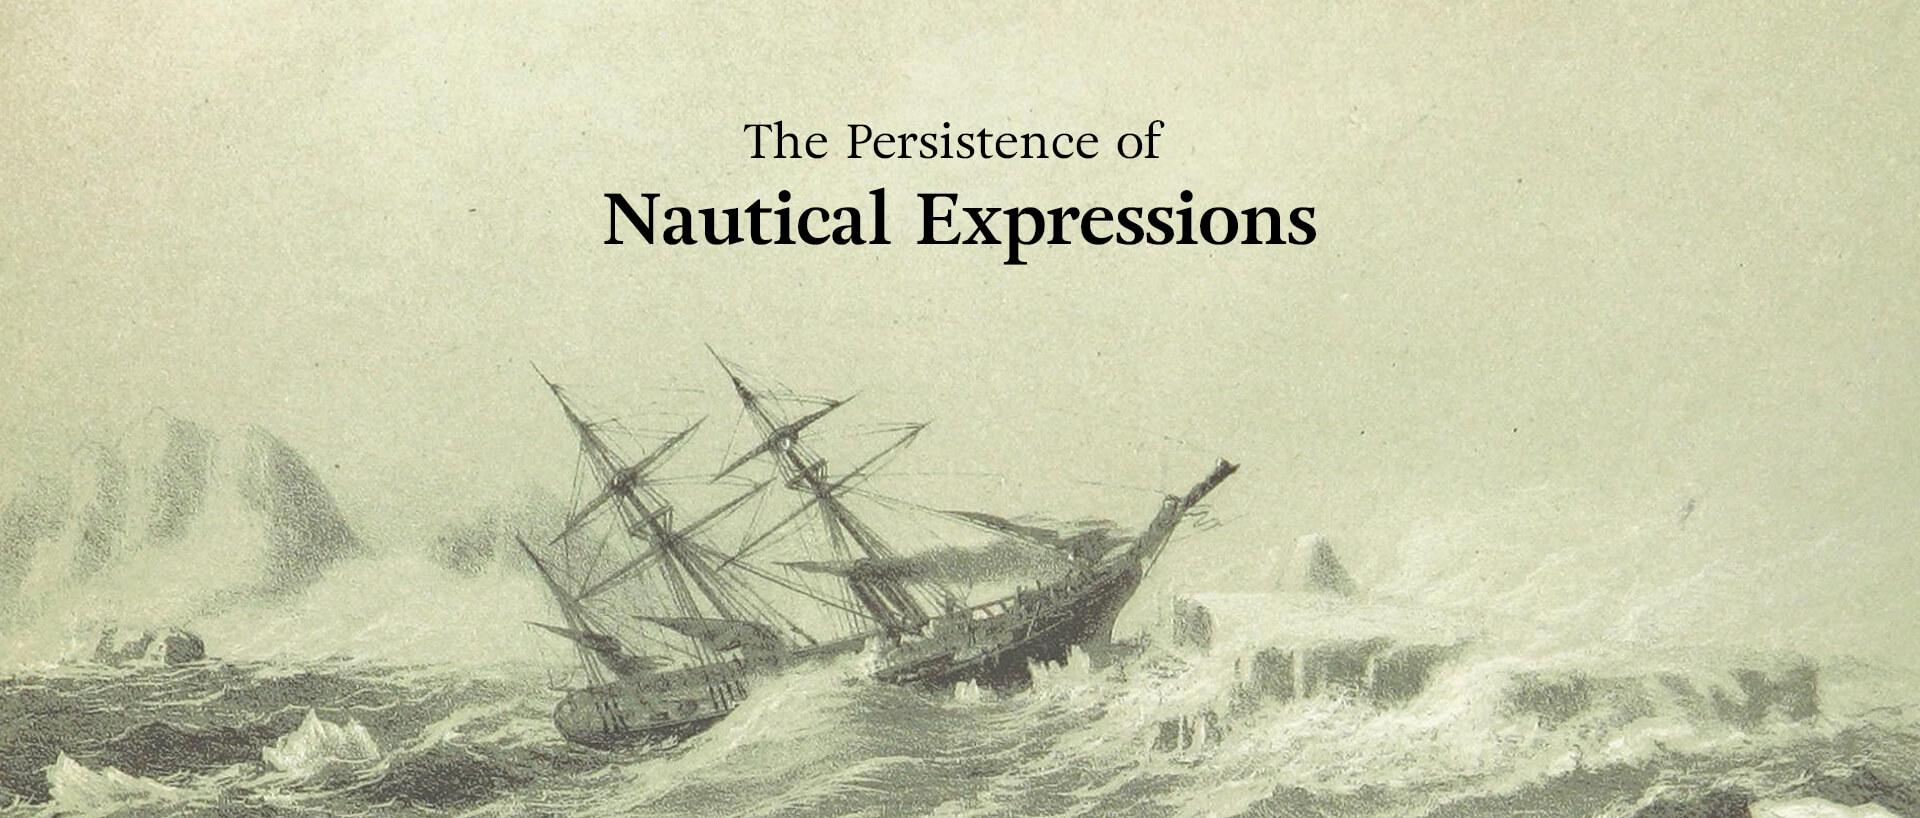 a lithograph of a ship navigating through waves